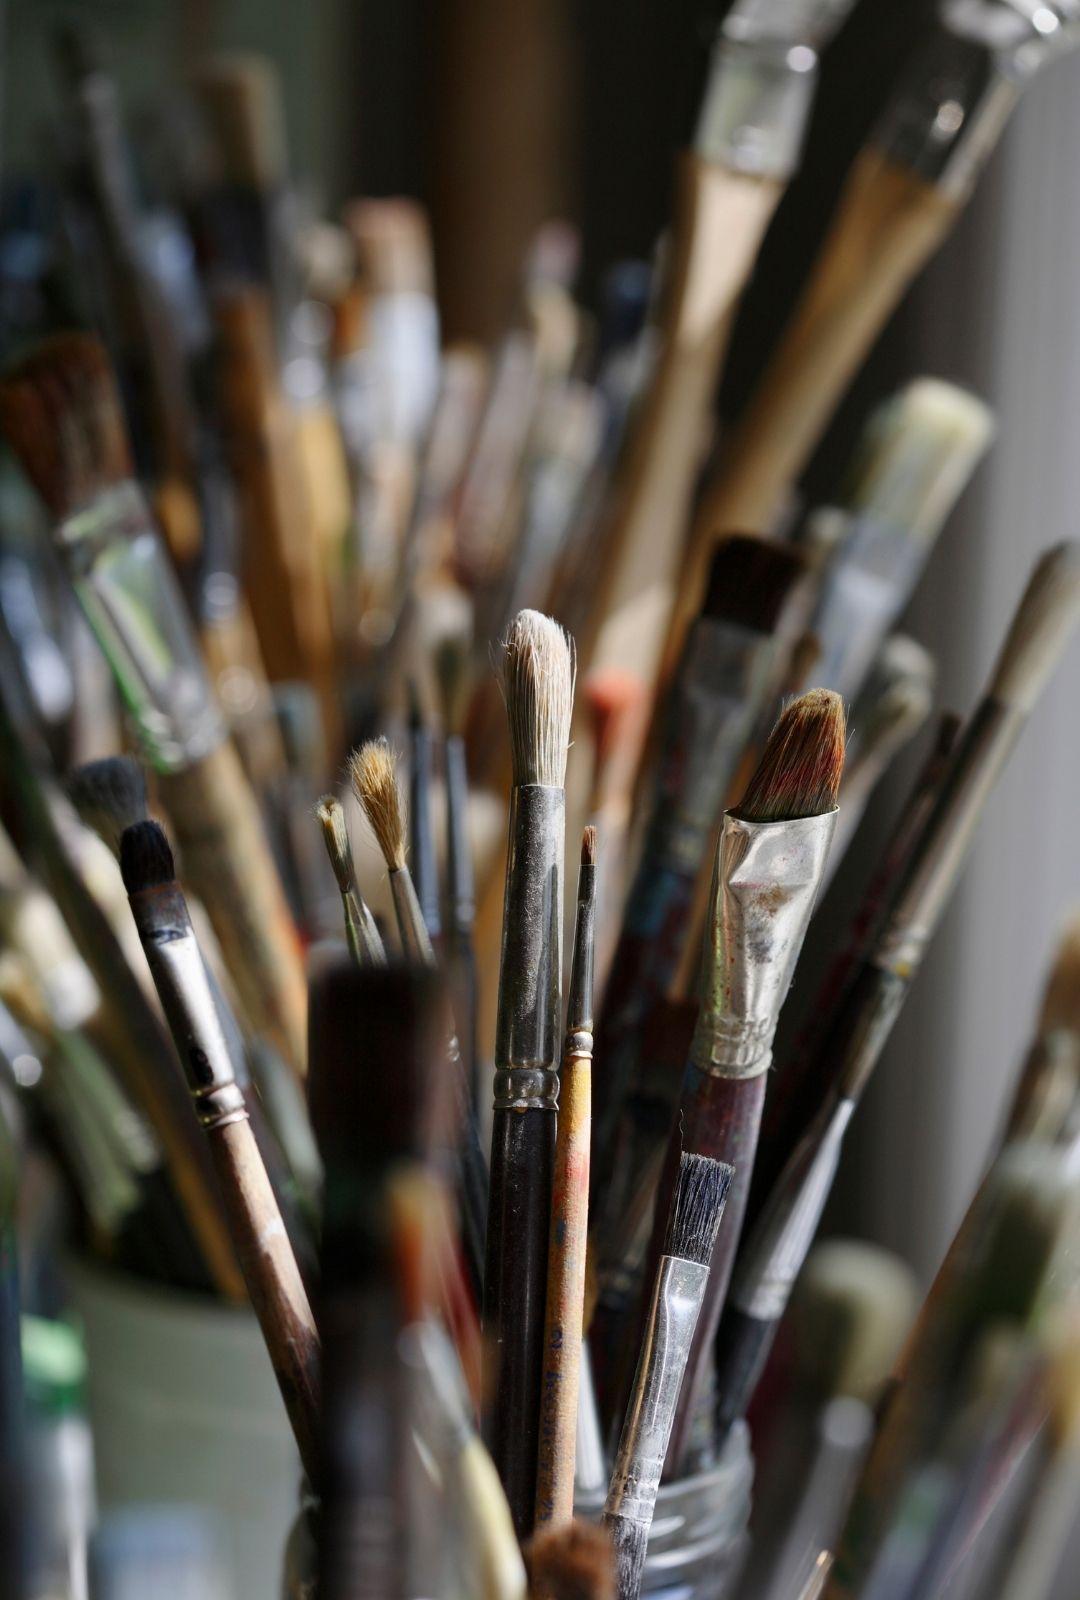 Brushes close up